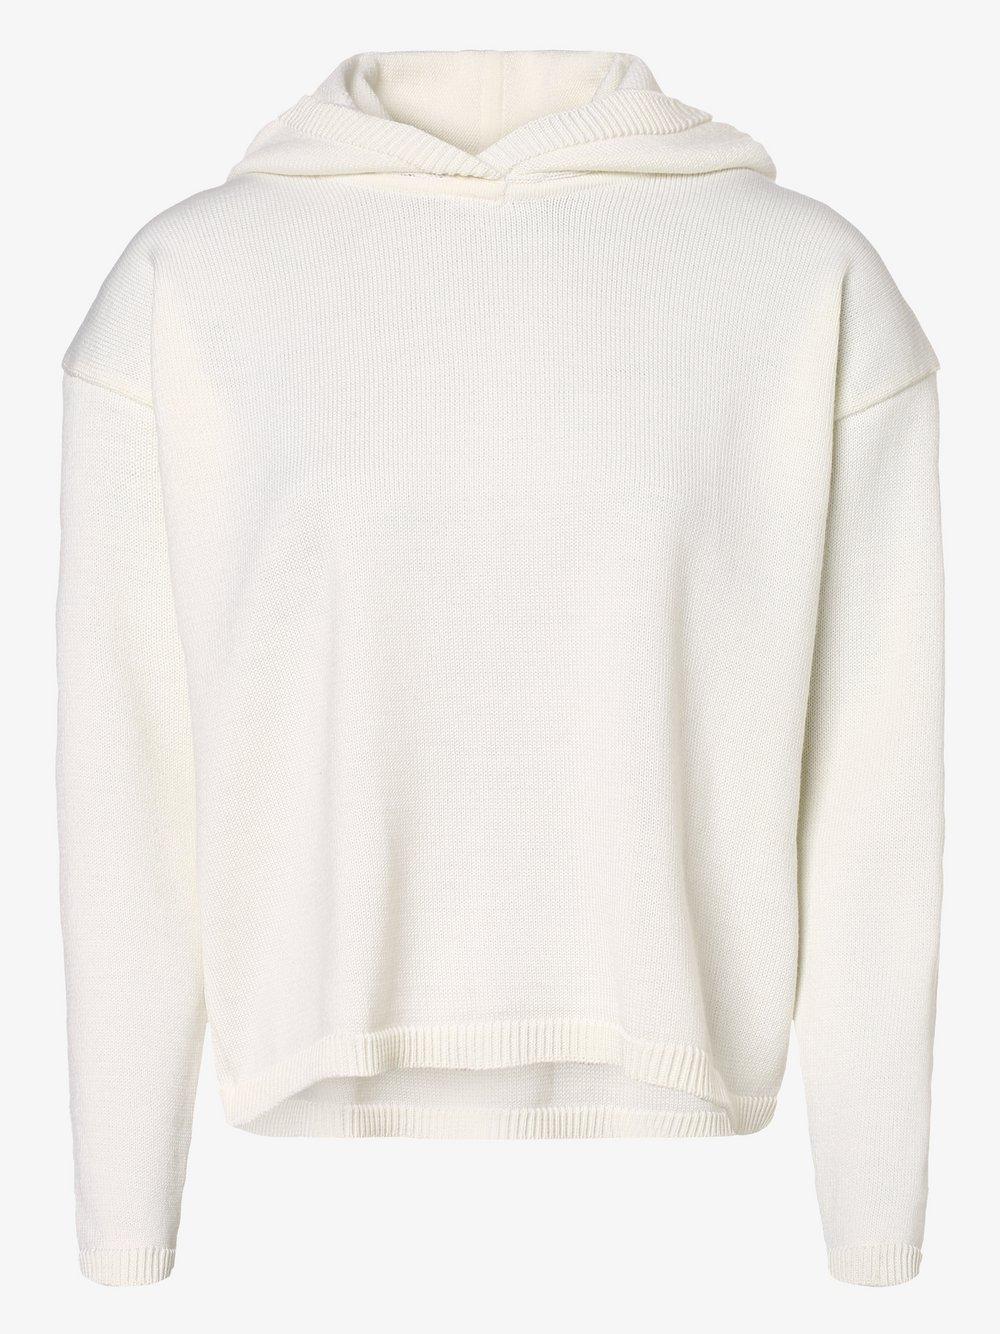 März – Sweter damski, beżowy Van Graaf 485534-0001-00380